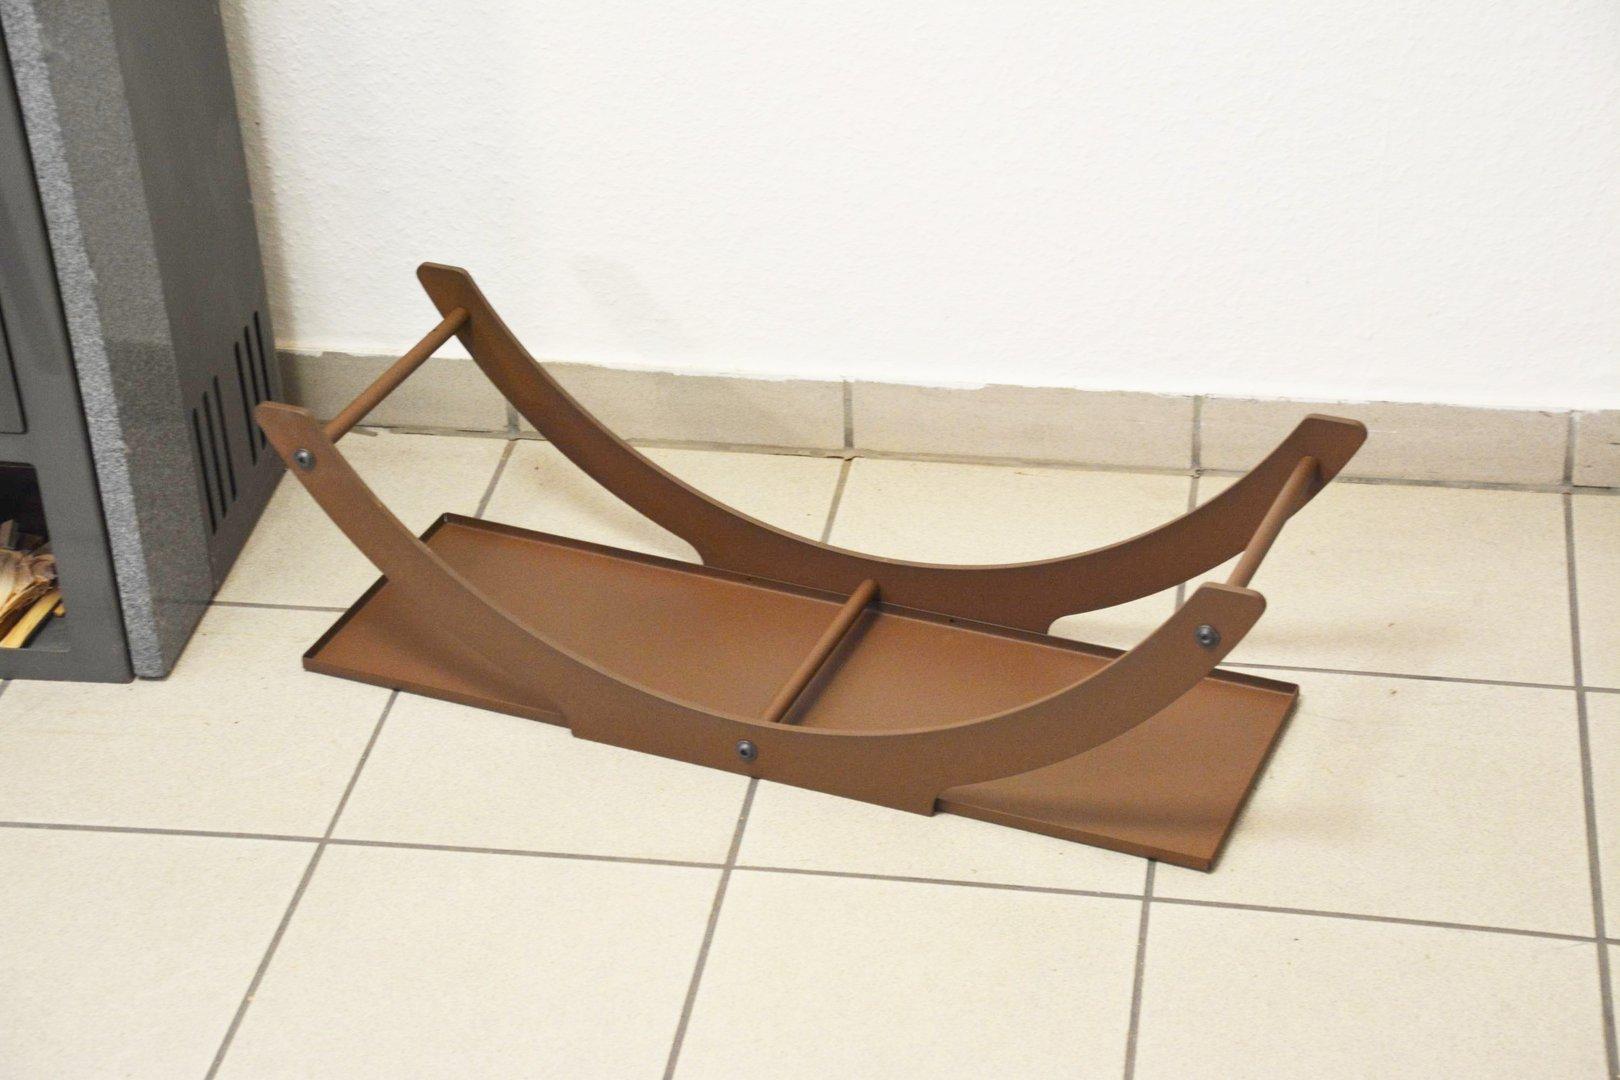 kaminholzschale innen bogen flach aus metall. Black Bedroom Furniture Sets. Home Design Ideas